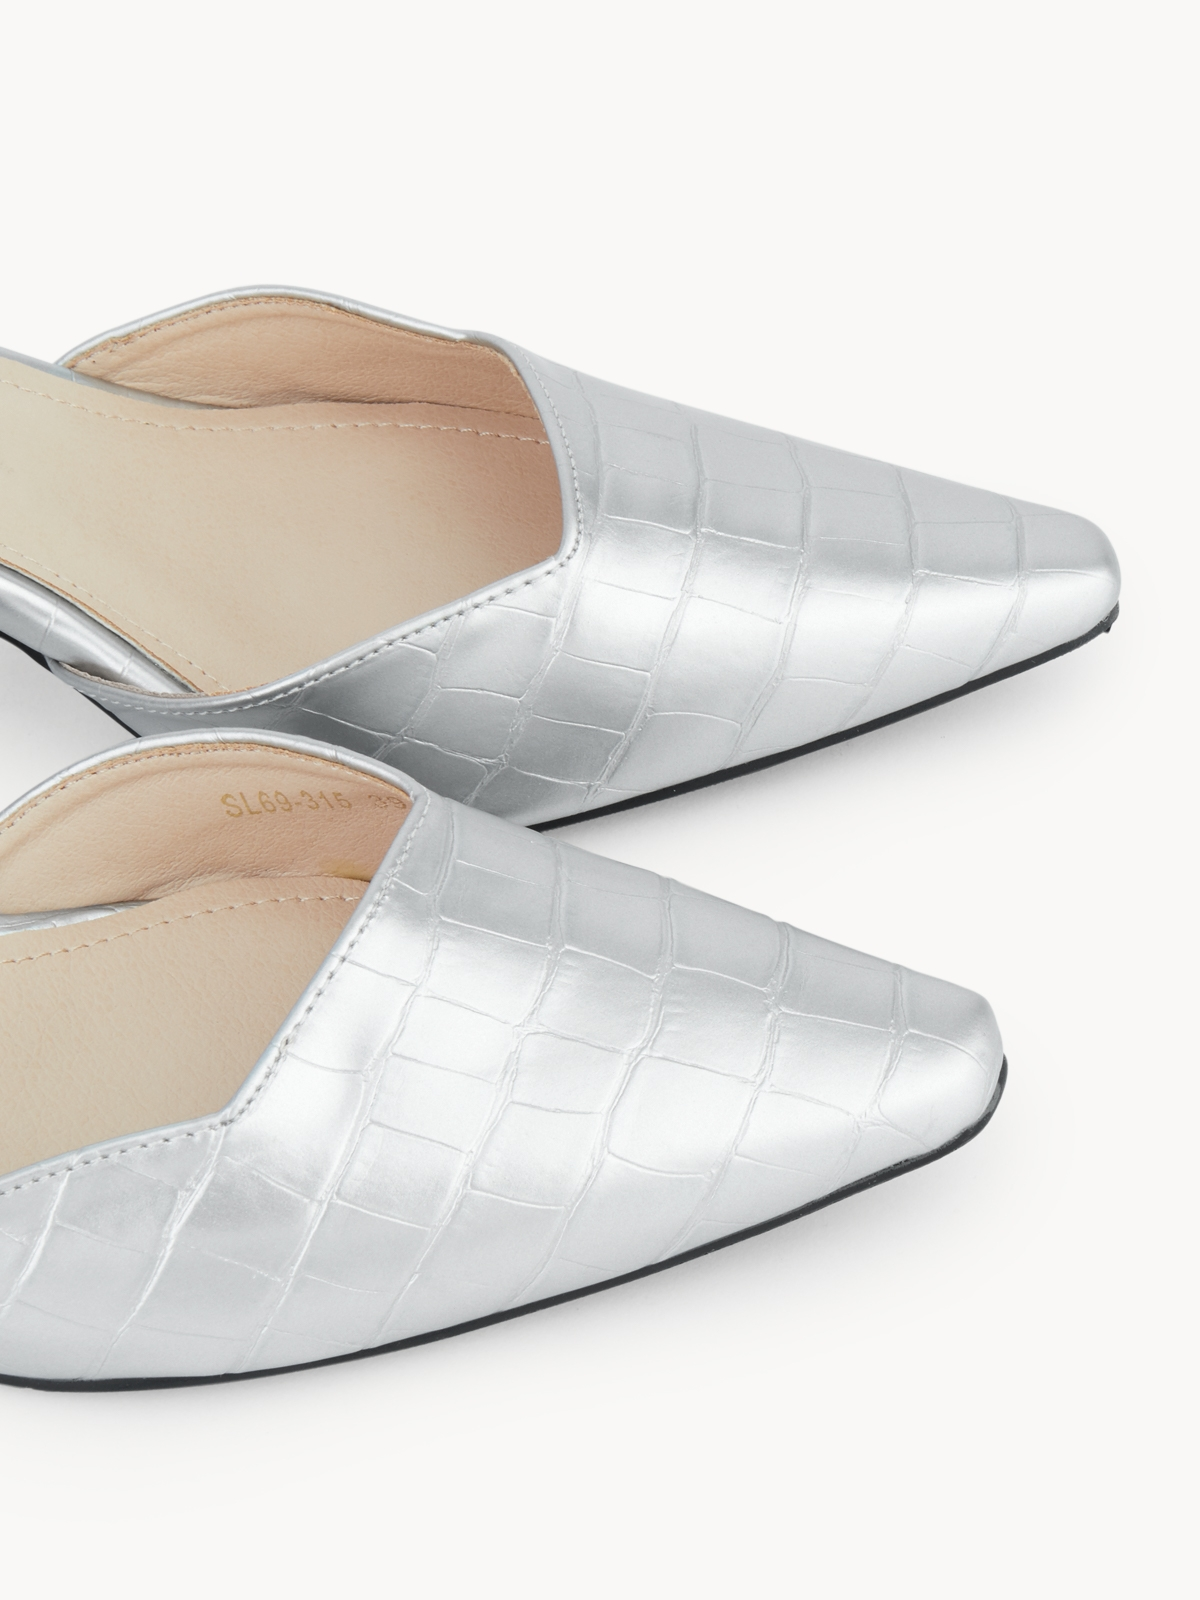 Starkela Round Cut Slingback Heels Silver